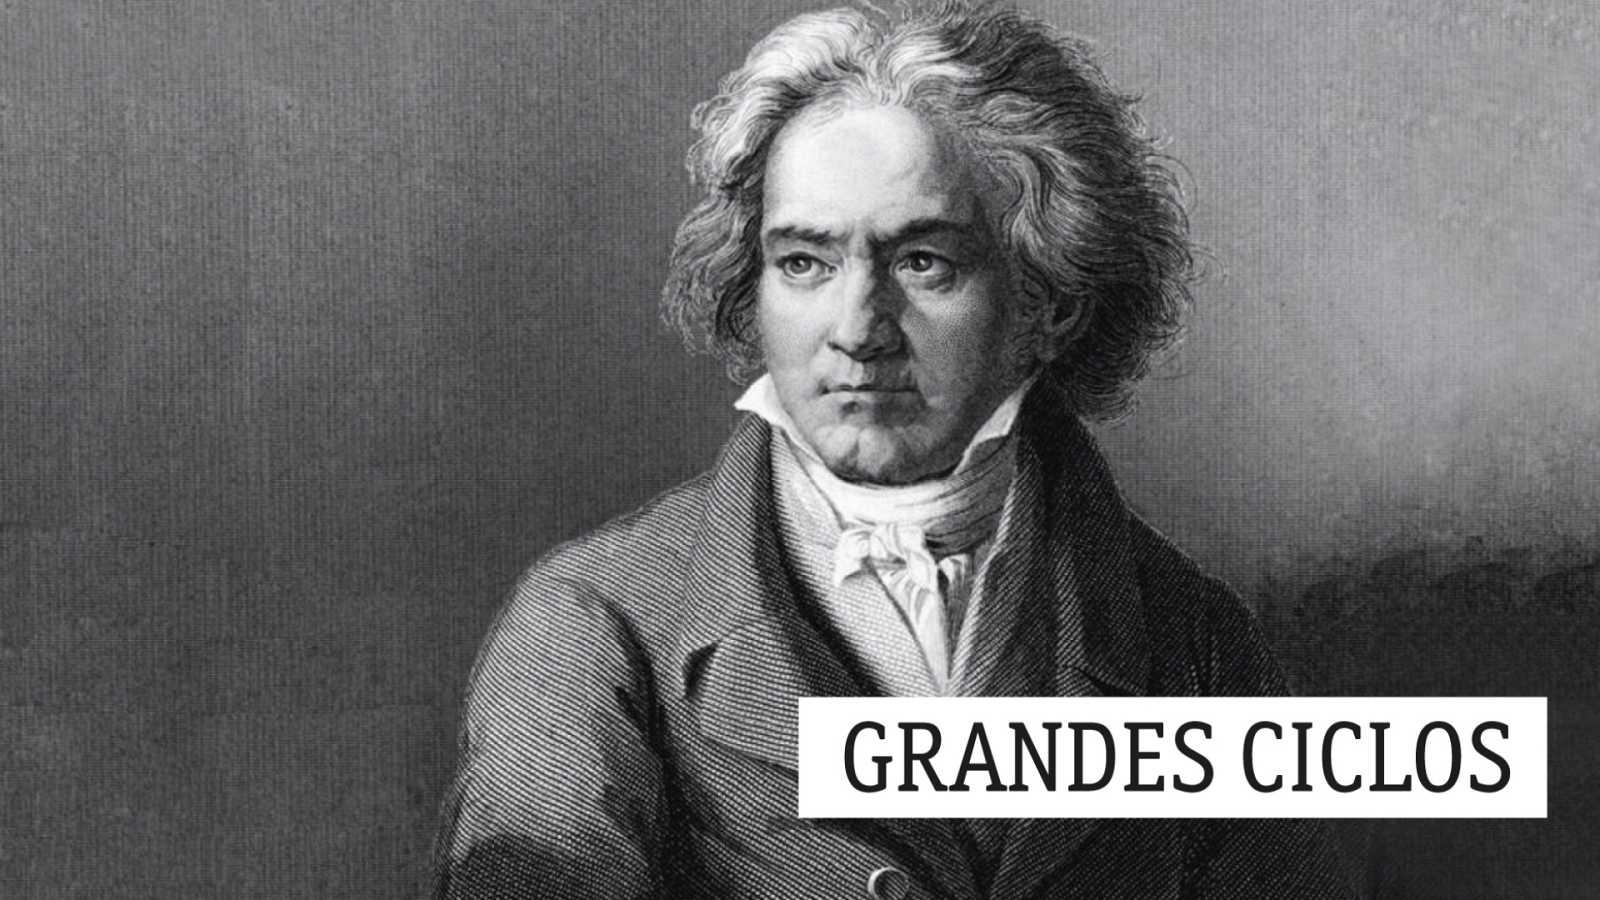 Grandes ciclos - L. van Beethoven (XXXVIII): #BTHVN2020 en Bonn (IV) - 06/03/20 - escuchar ahora